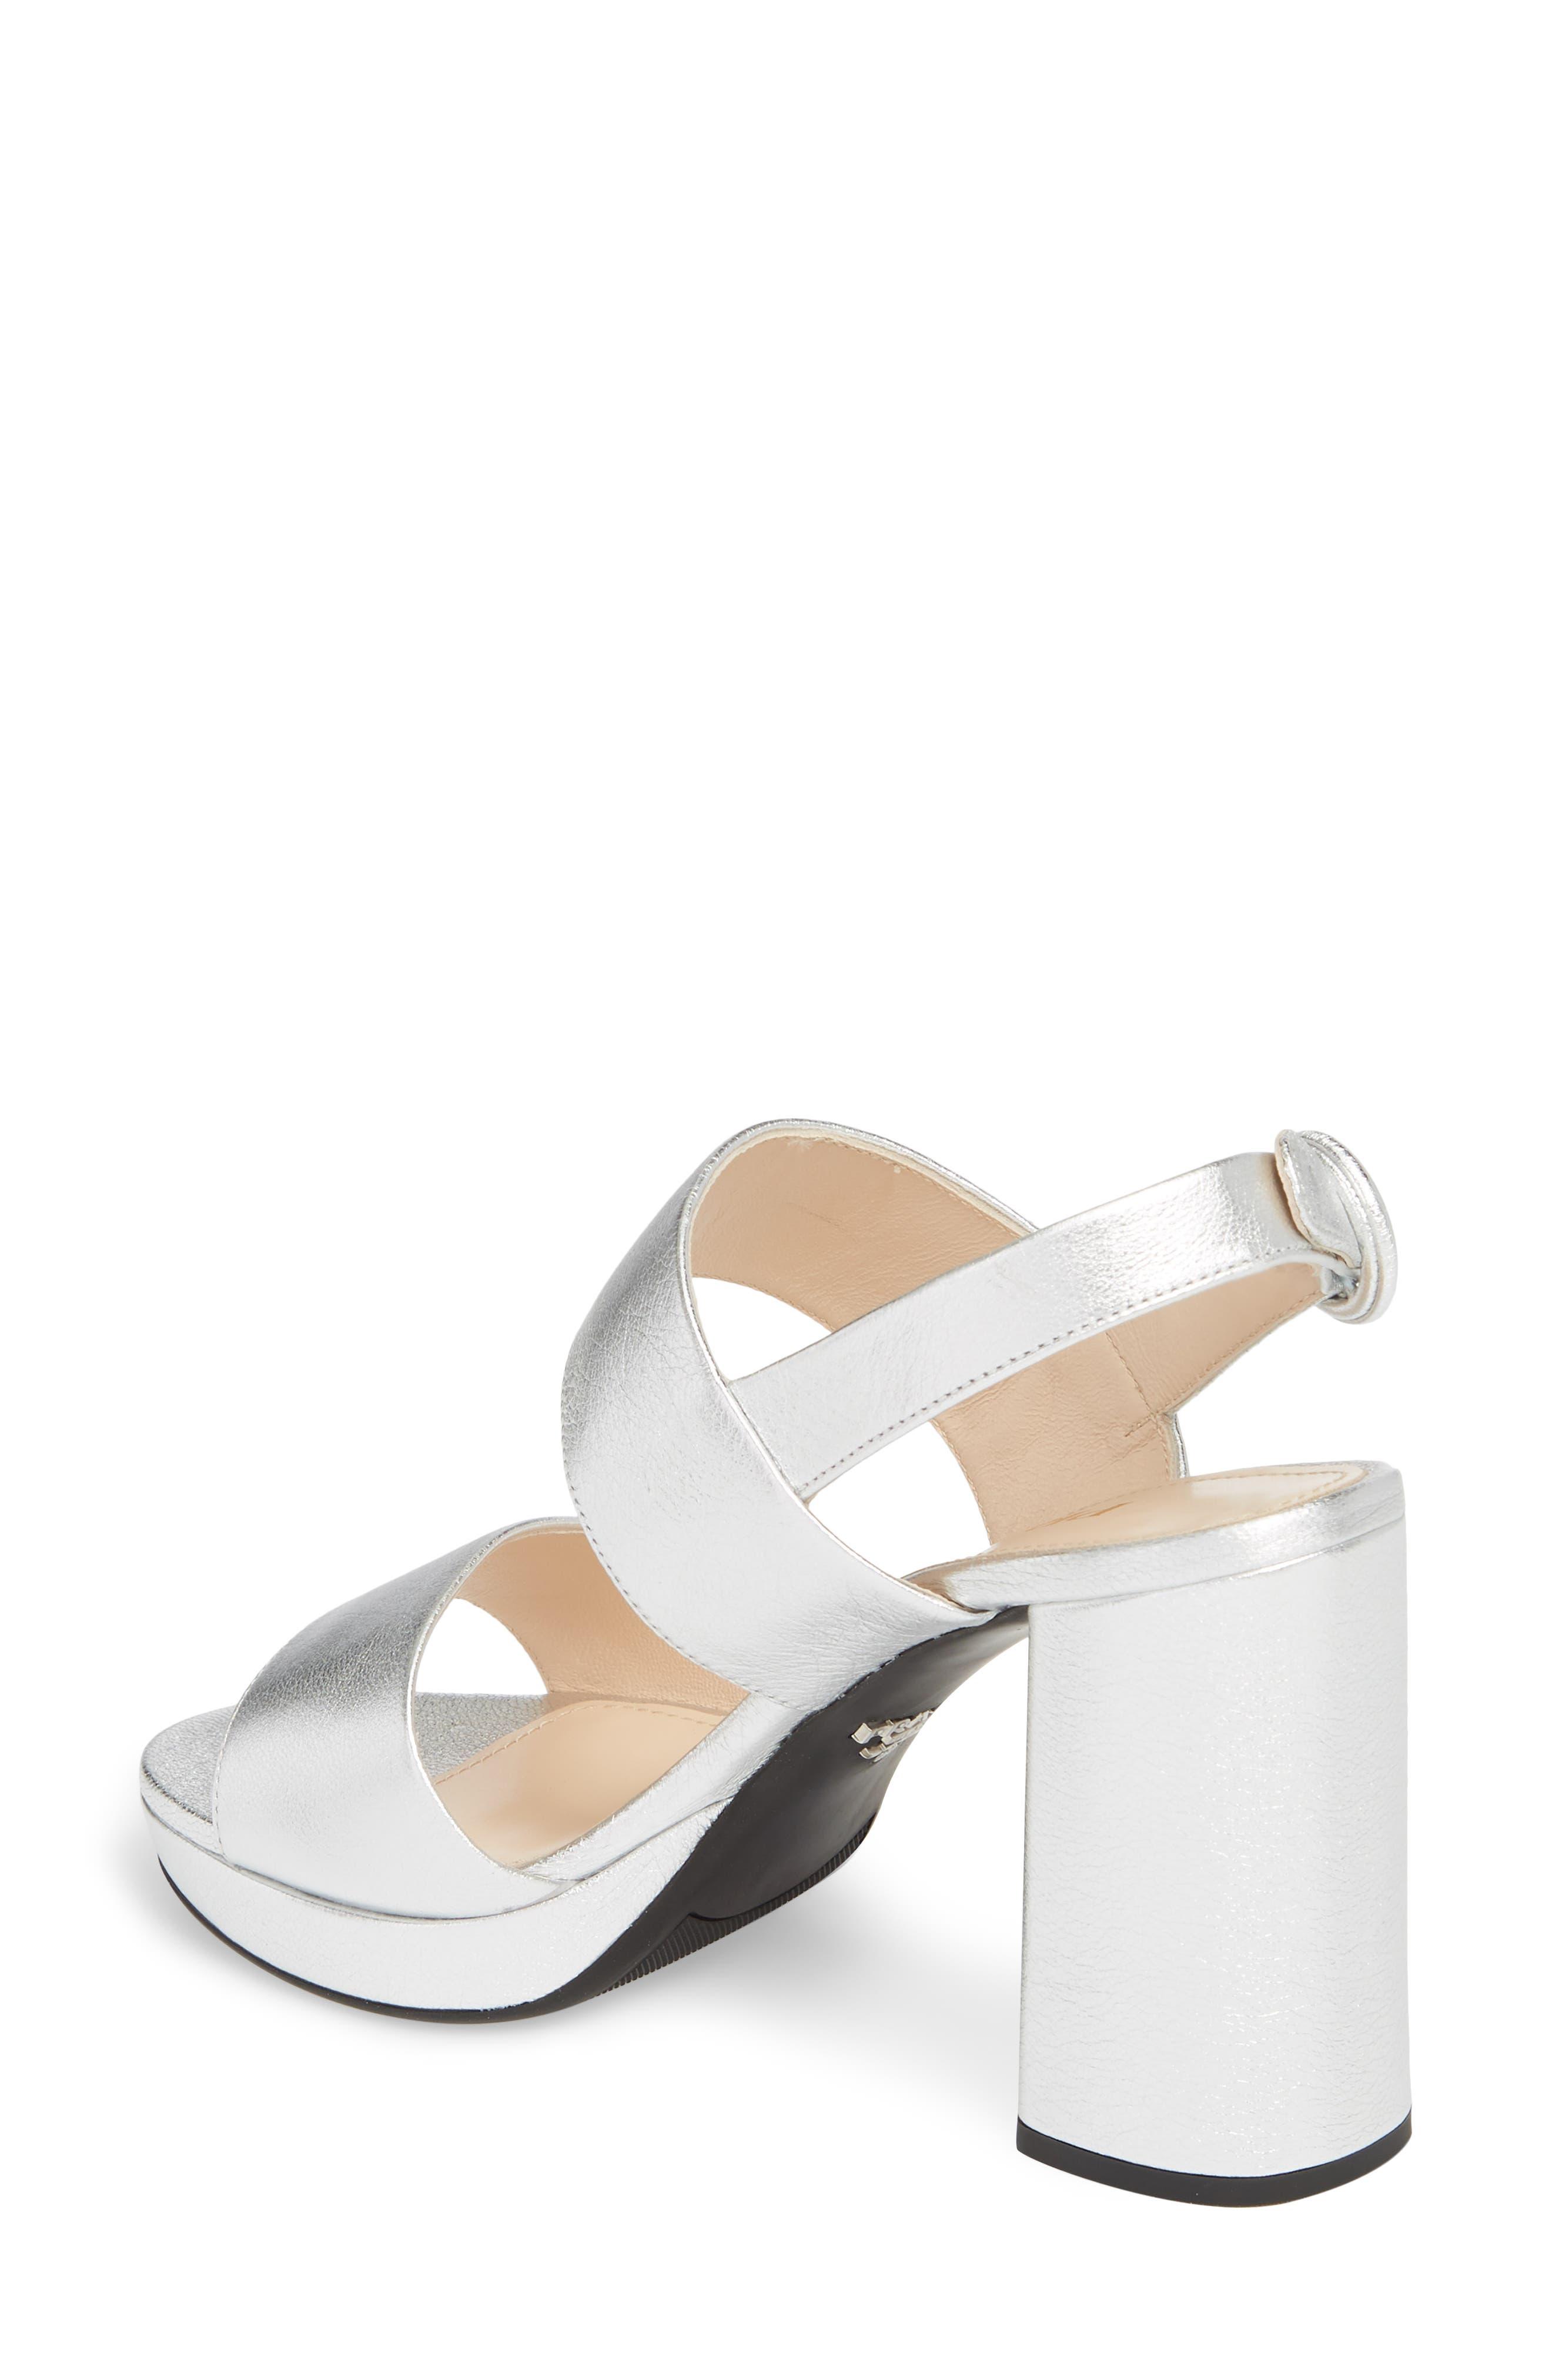 PRADA, Double Band Platform Sandal, Alternate thumbnail 2, color, SILVER